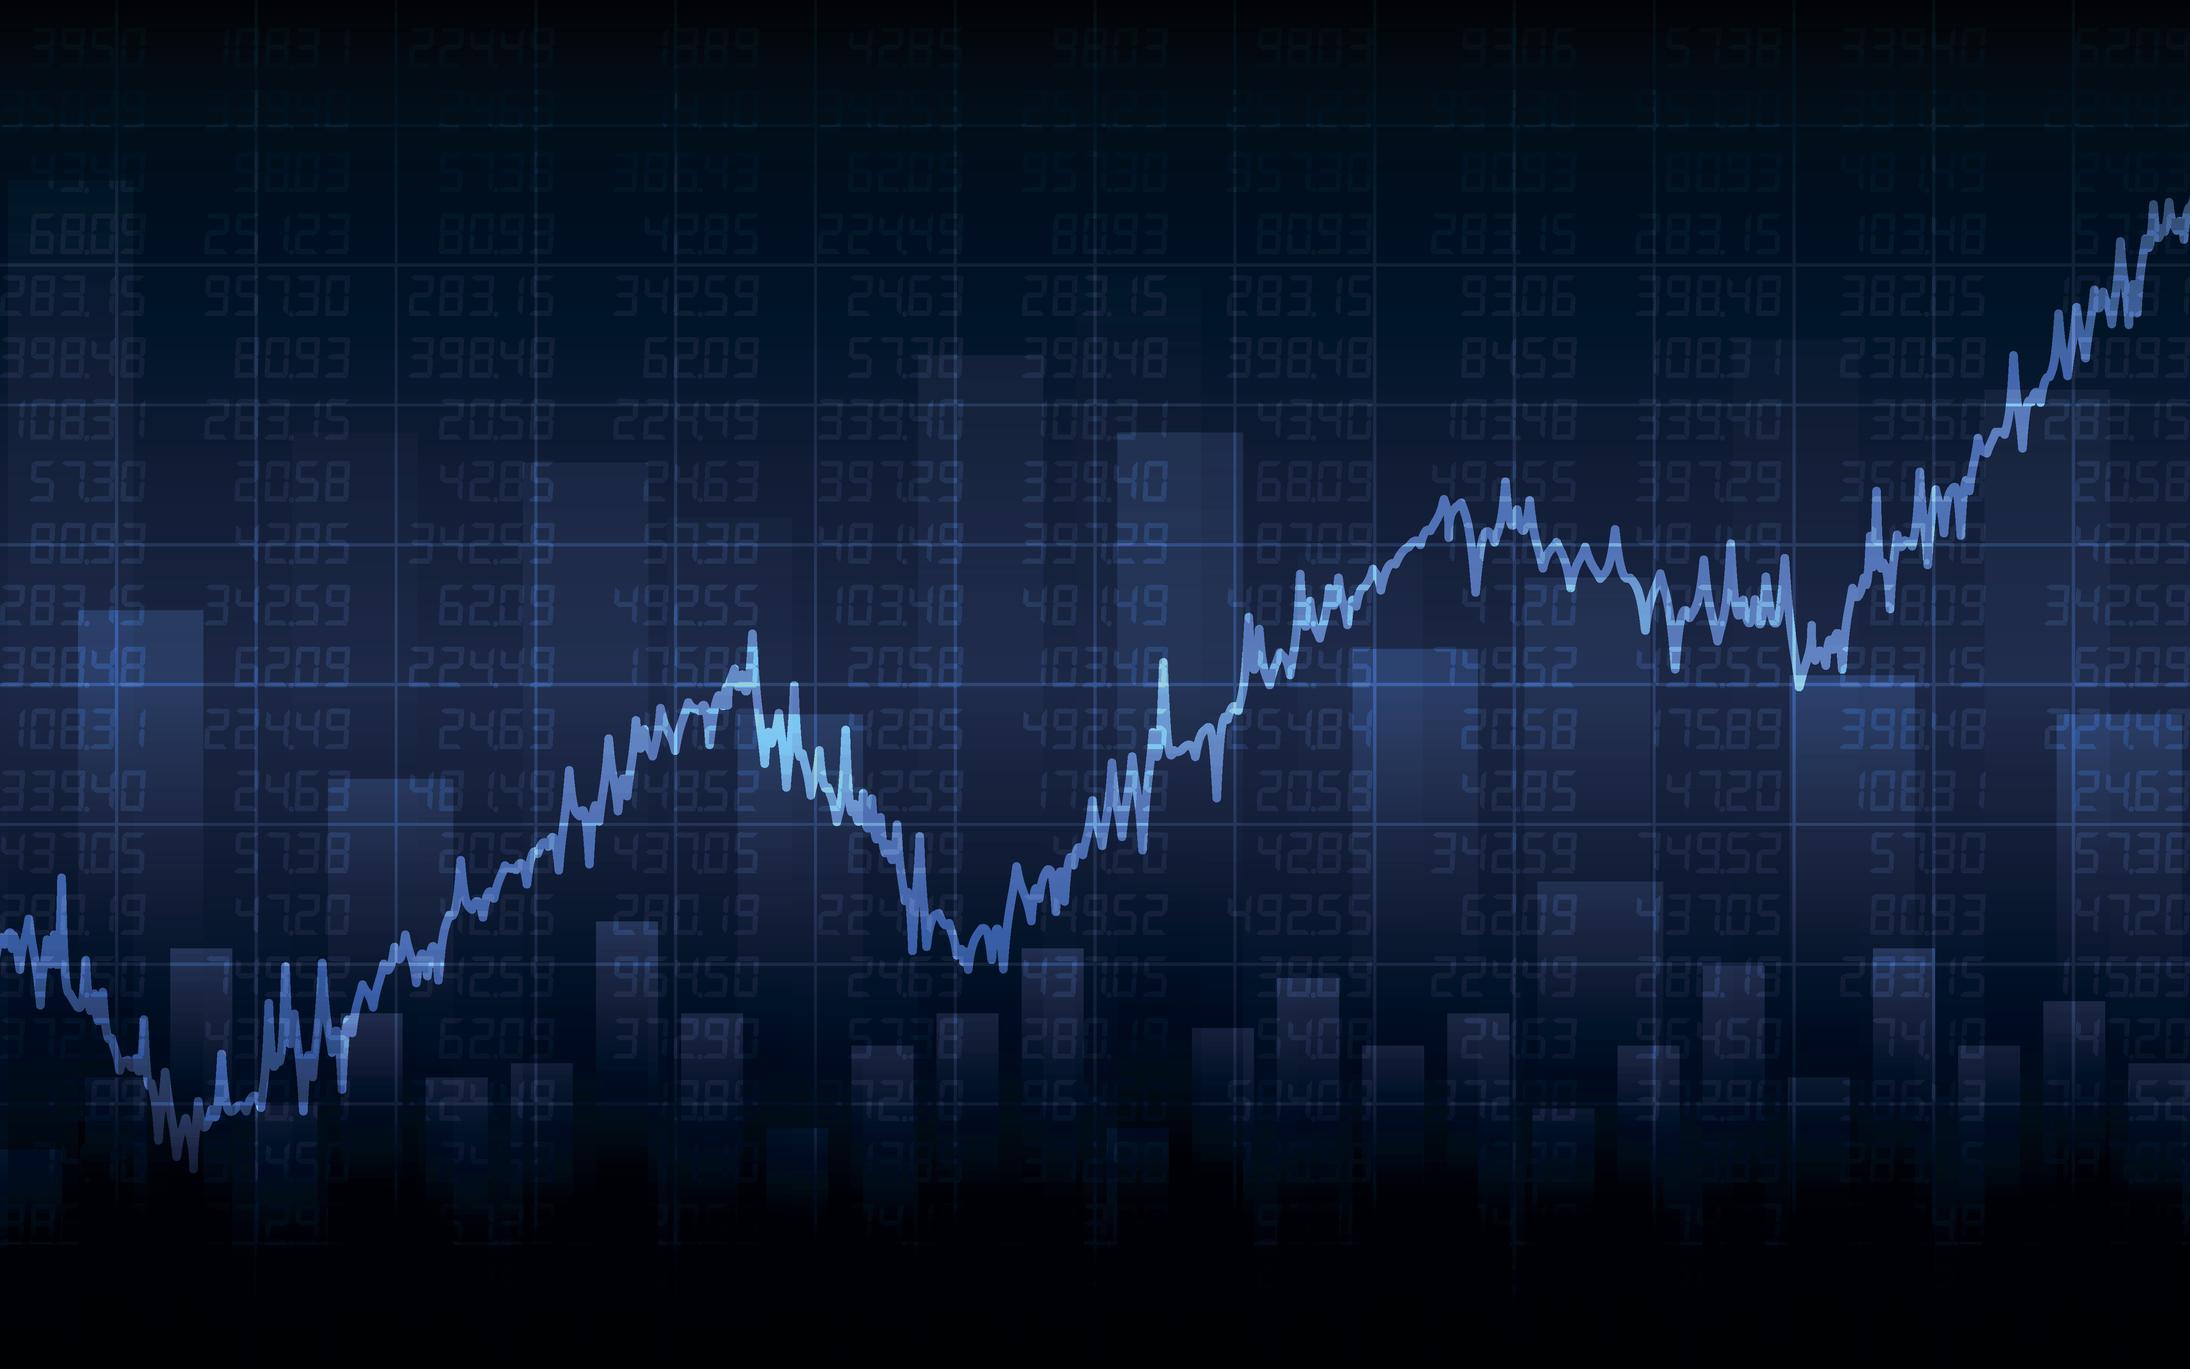 Line graph going up on dark background